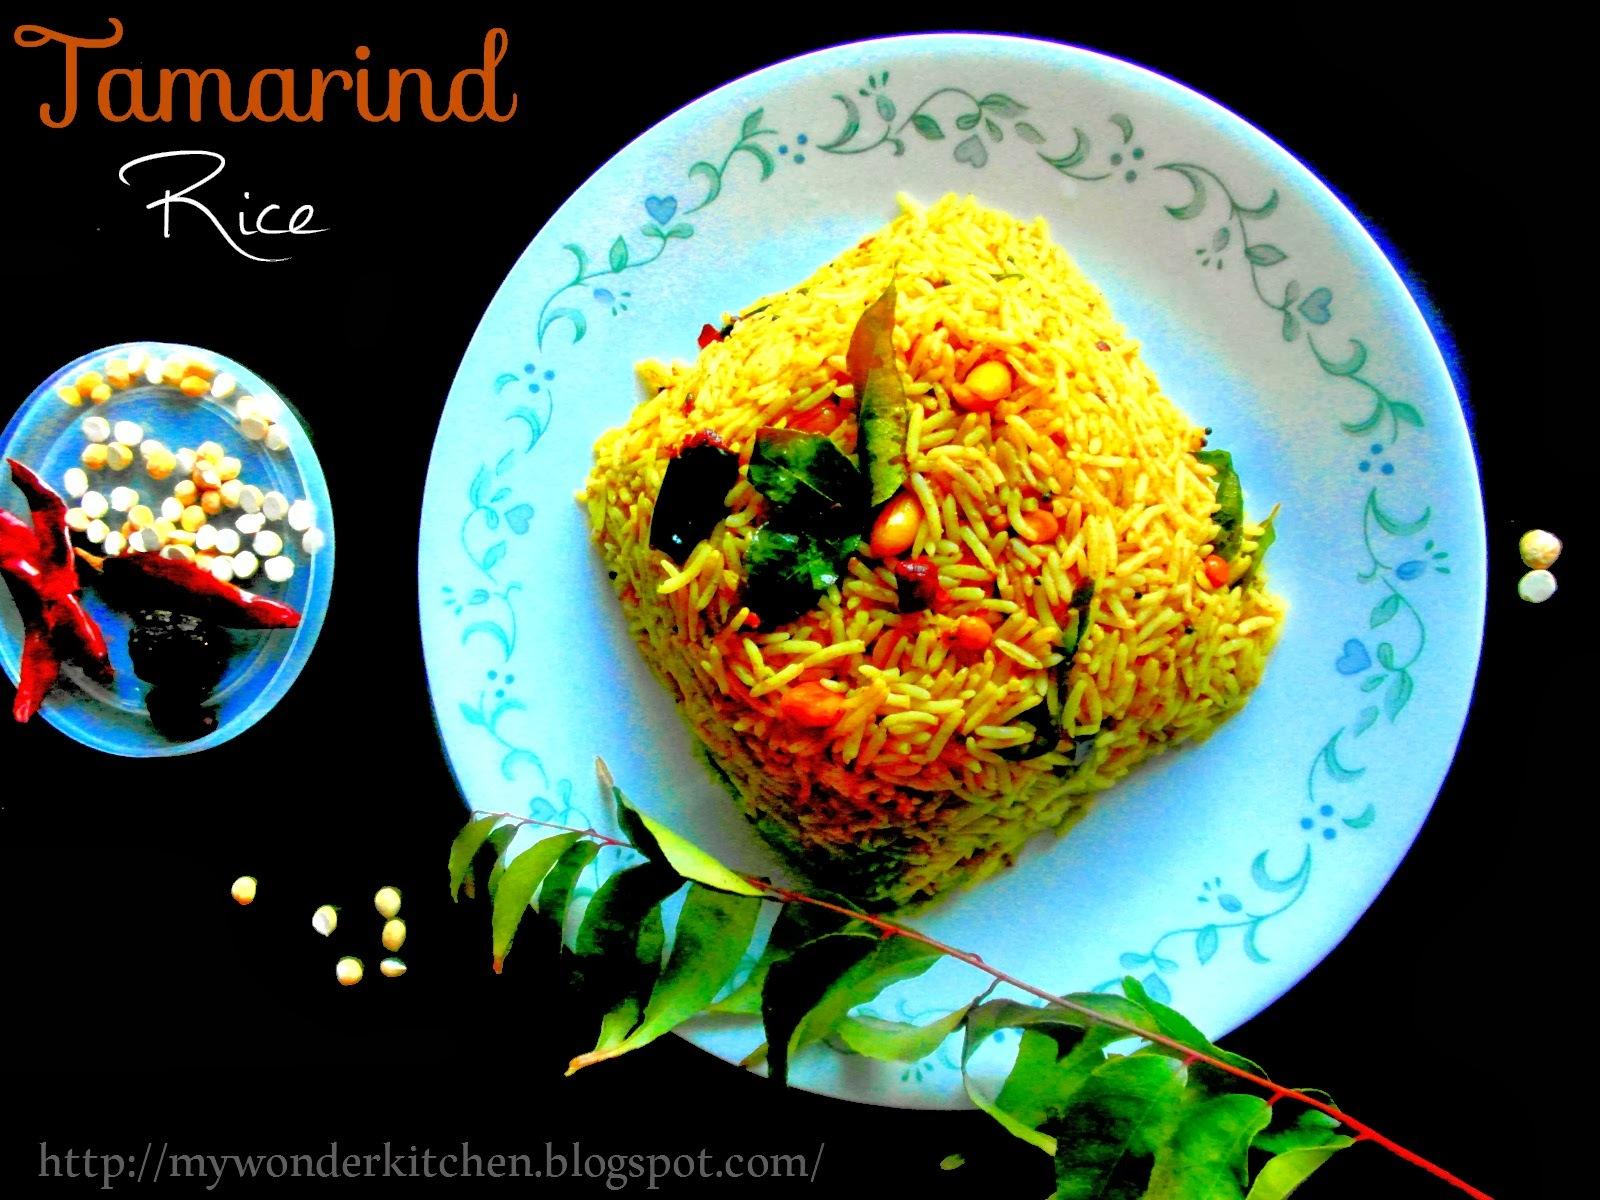 Tamarind rice|Imli Bhath|Puliyoara/Andhra cusine|Puliyodarai\Tamil Iyengar cusine